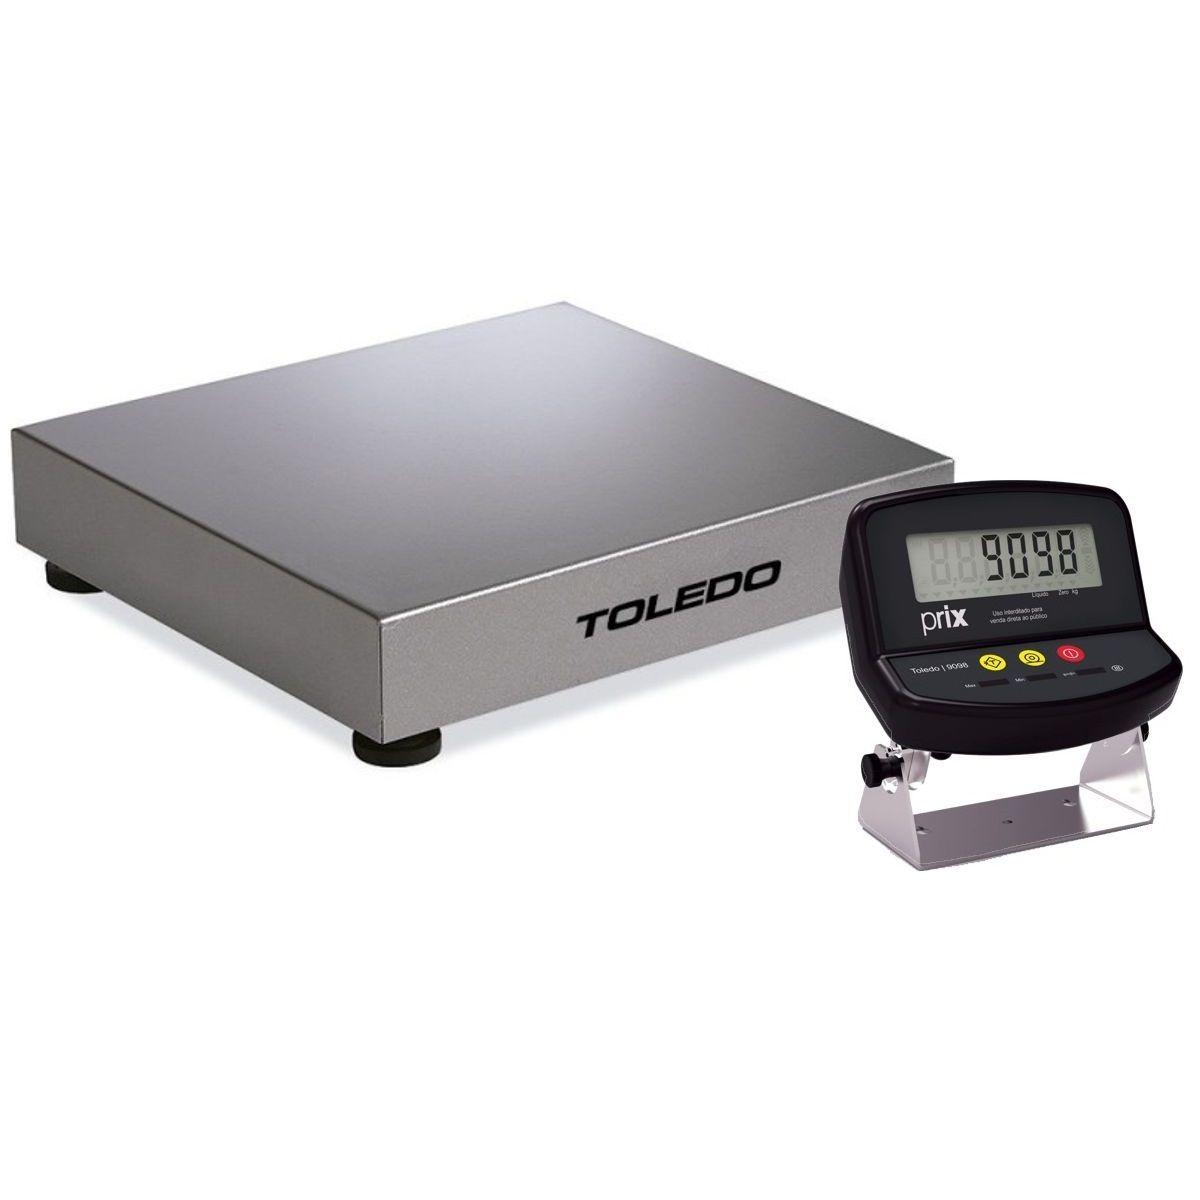 Balança de Piso Toledo 2098 (120Kgx20g) (50x50cm)